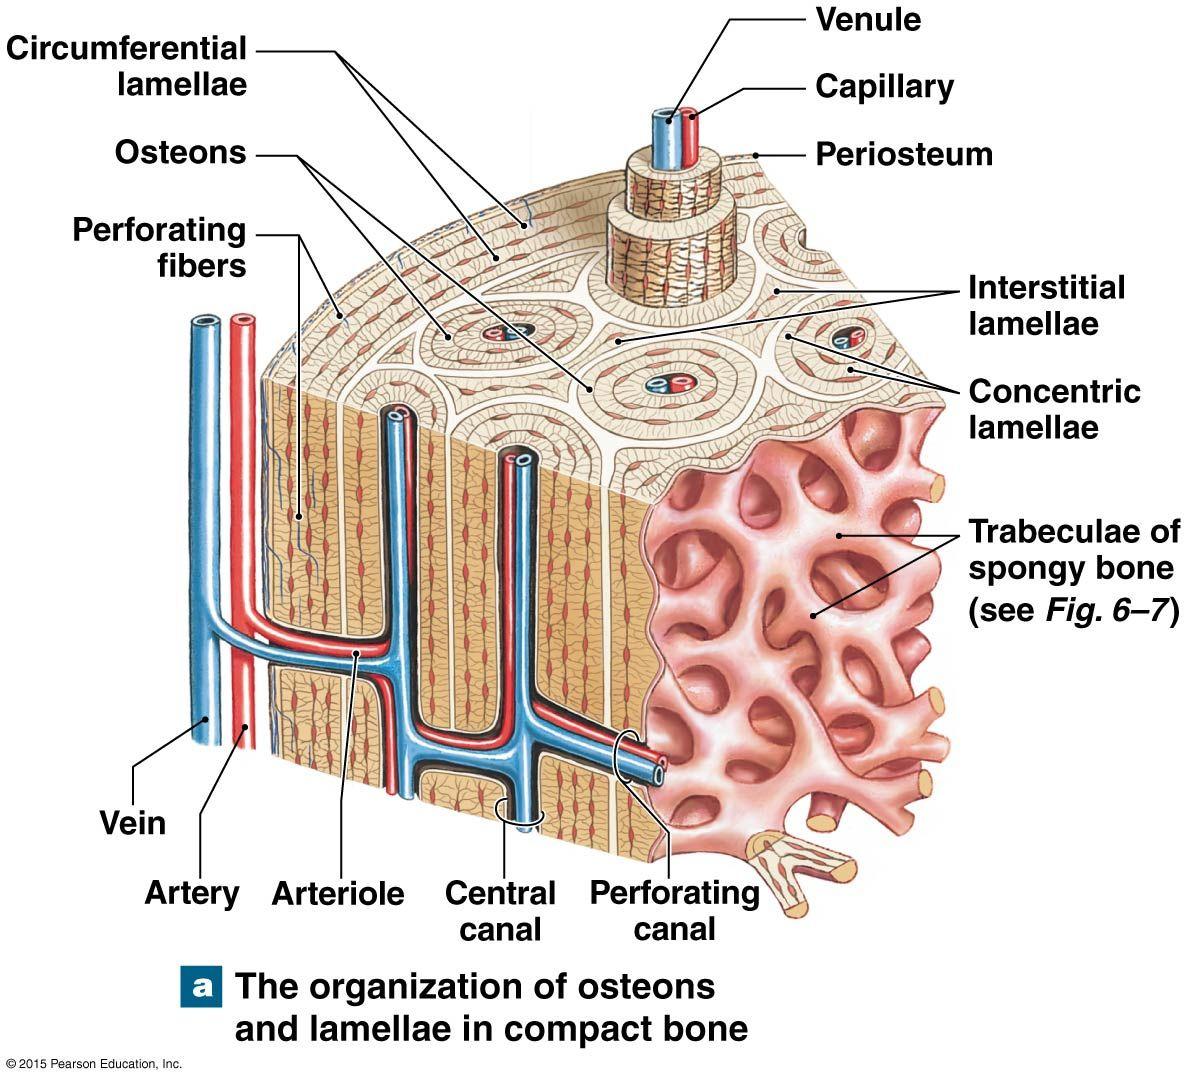 medium resolution of spongy bone containg red bone marrow